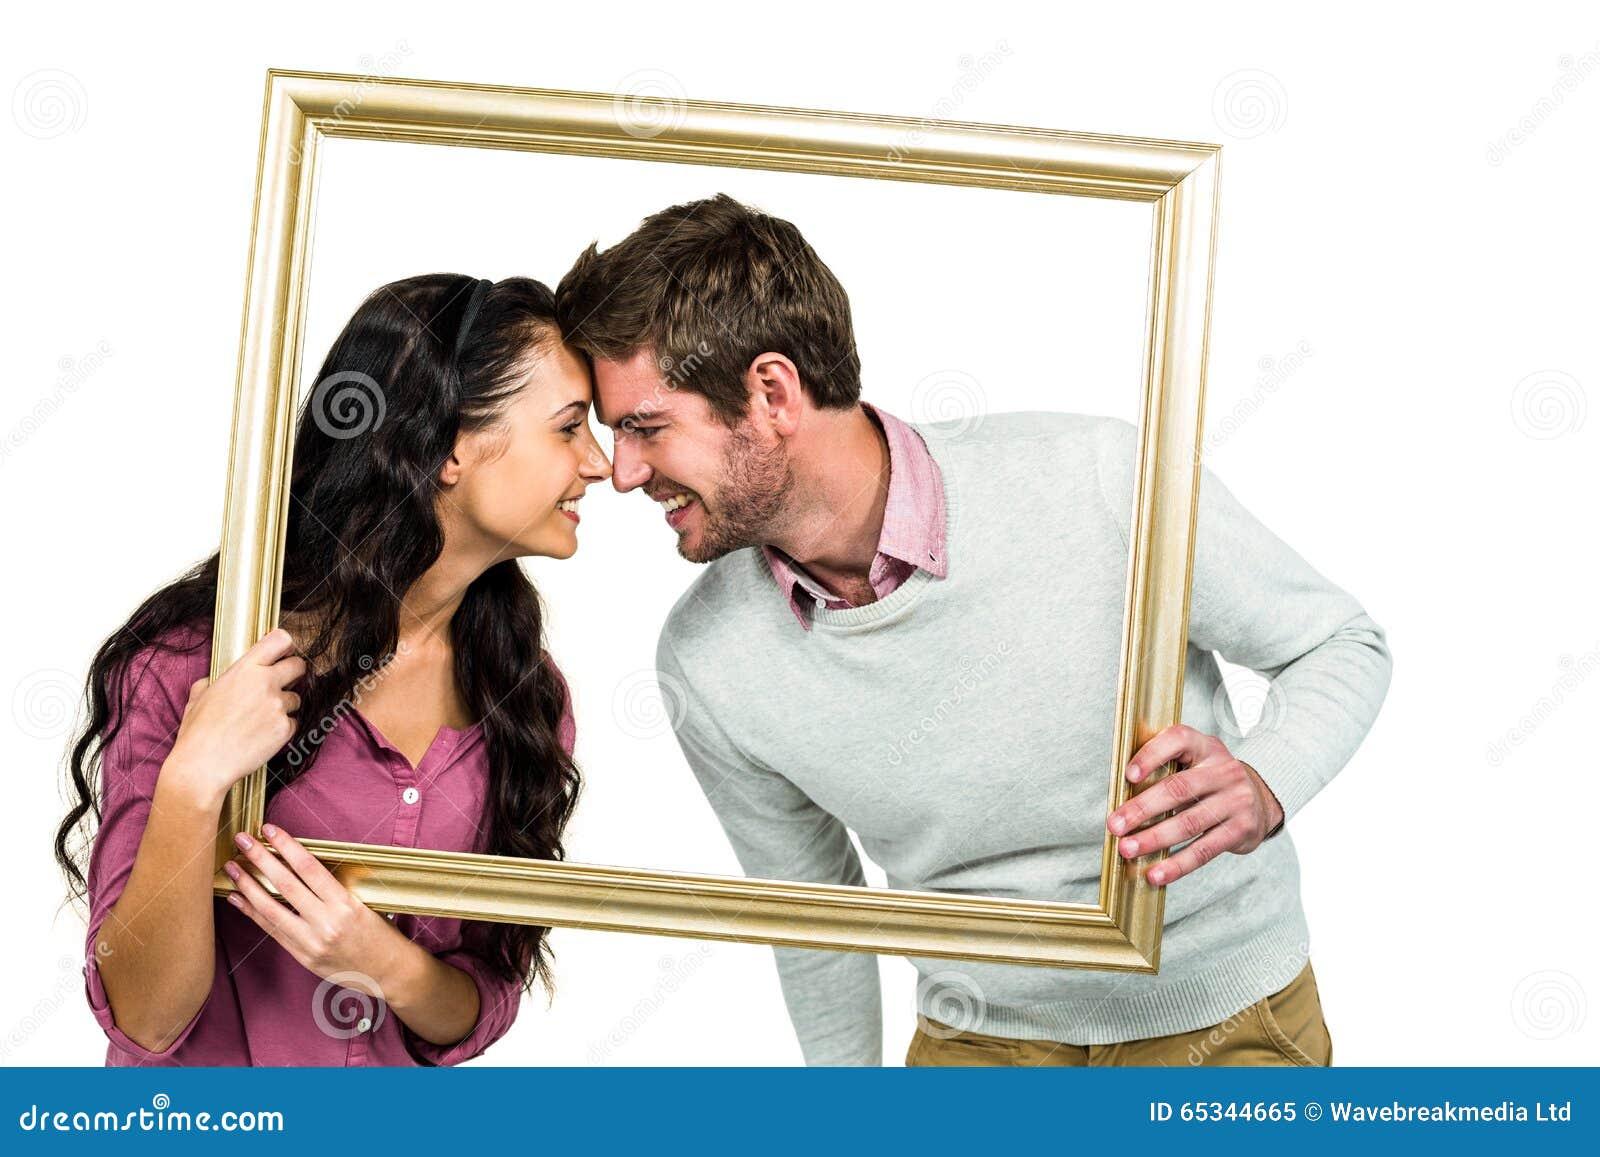 Berühmt Paare Bilderrahmen Fotos - Rahmen Ideen - markjohnsonshow.info